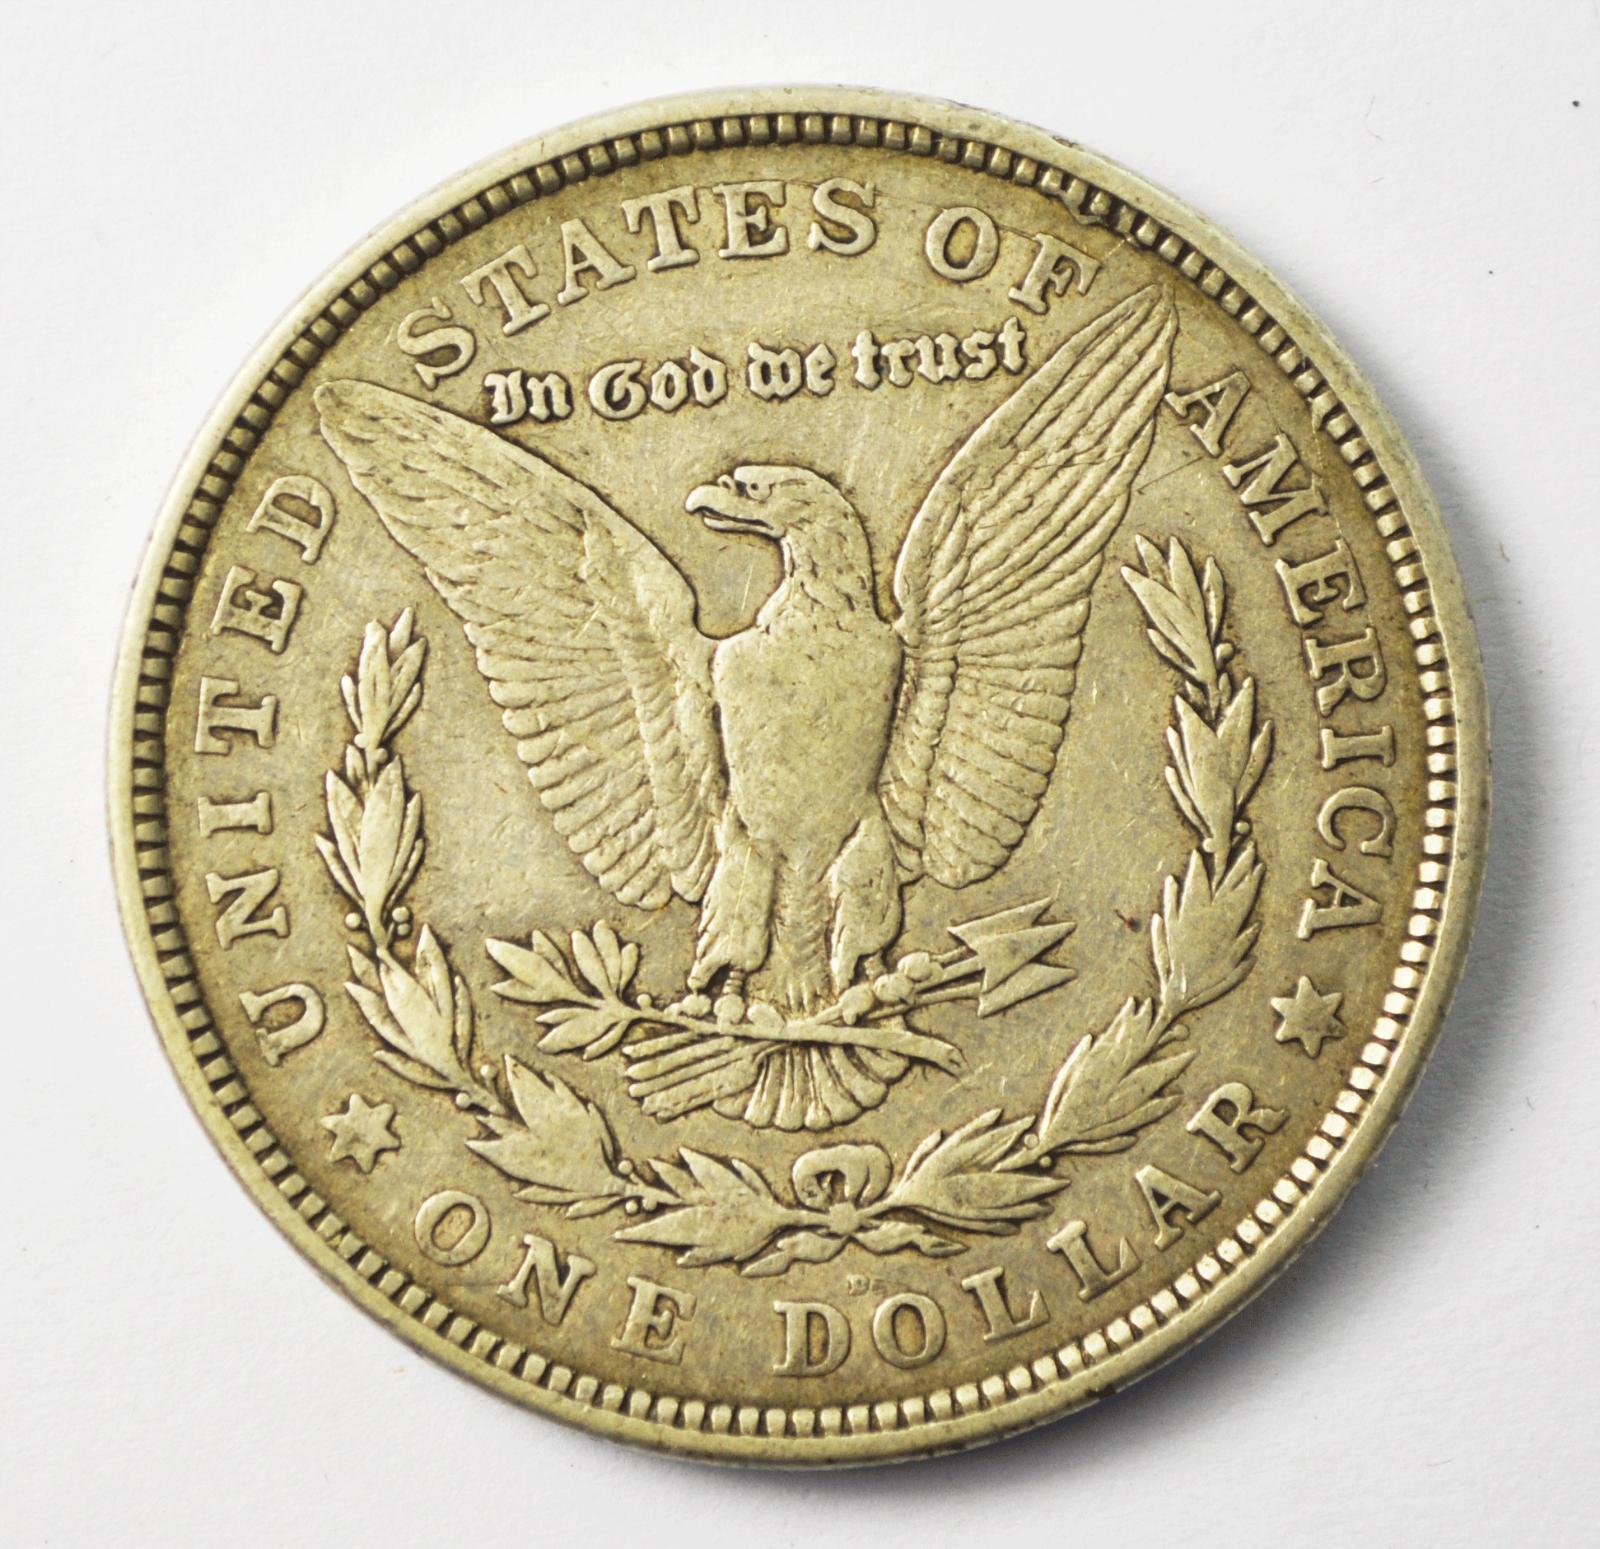 1921 D $1 Morgan Silver One Dollar US Denver VAM 4A Dot Die Break